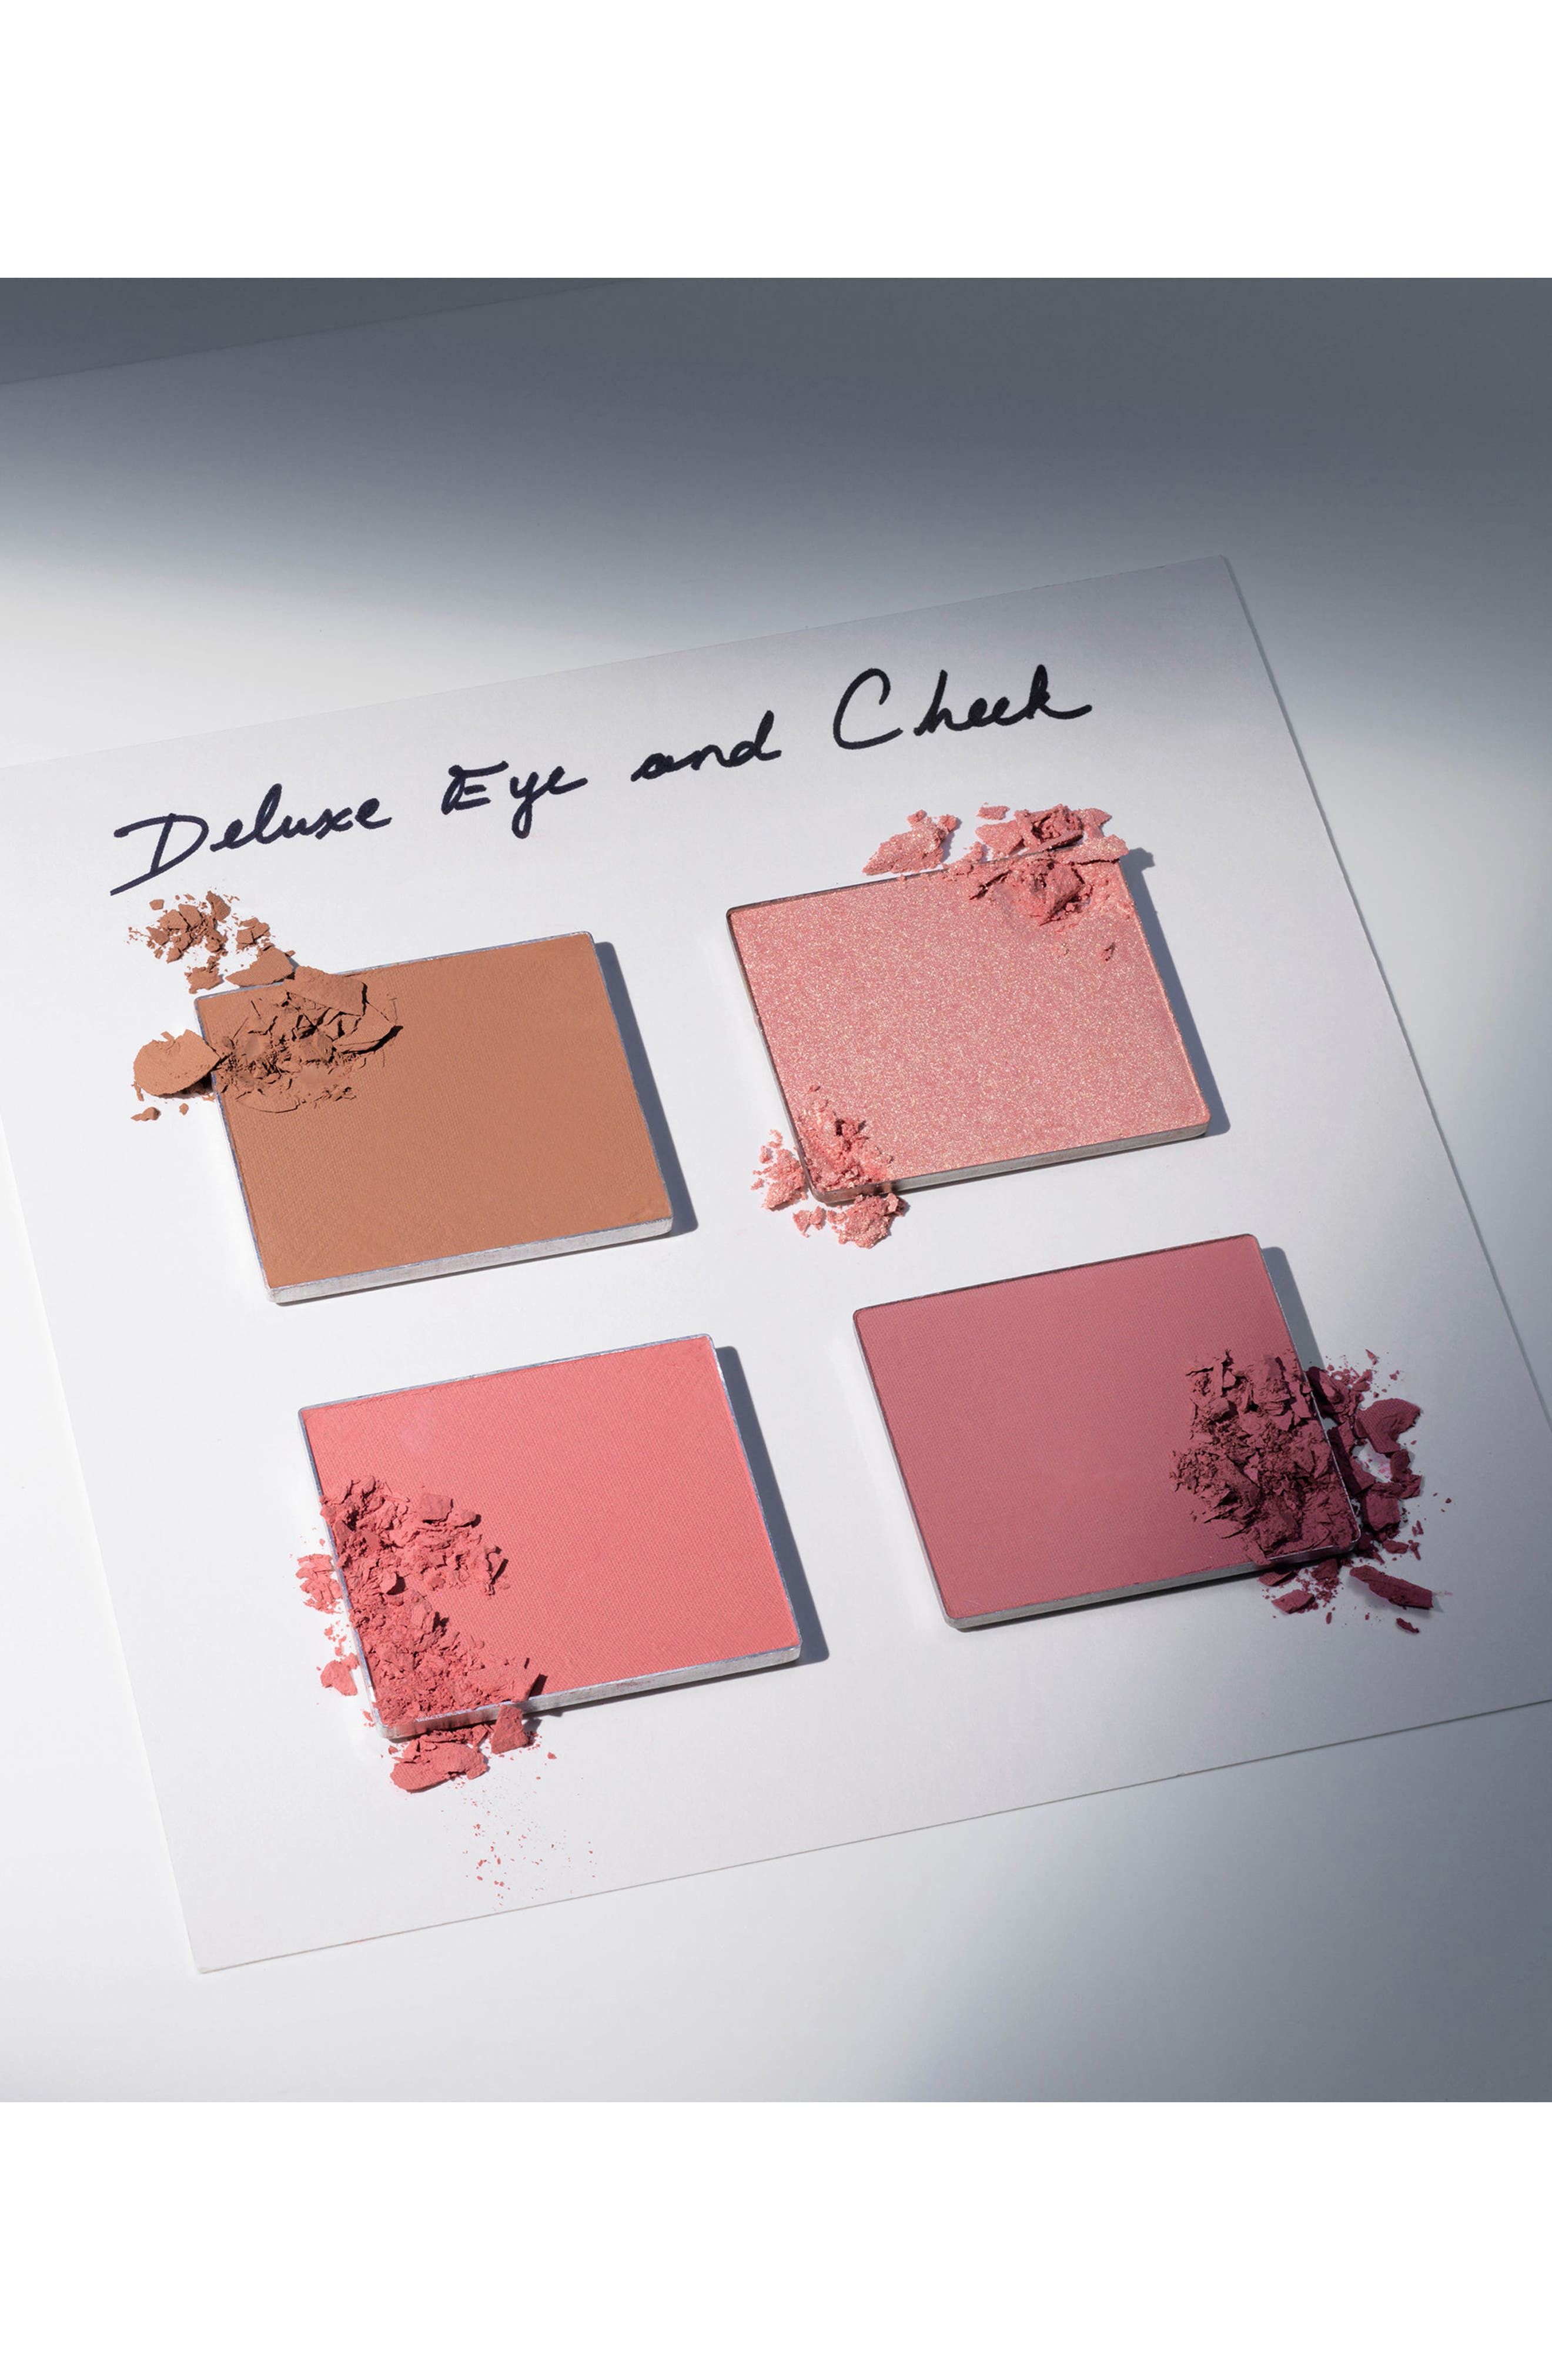 Deluxe Eye & Cheek Set,                             Alternate thumbnail 13, color,                             000